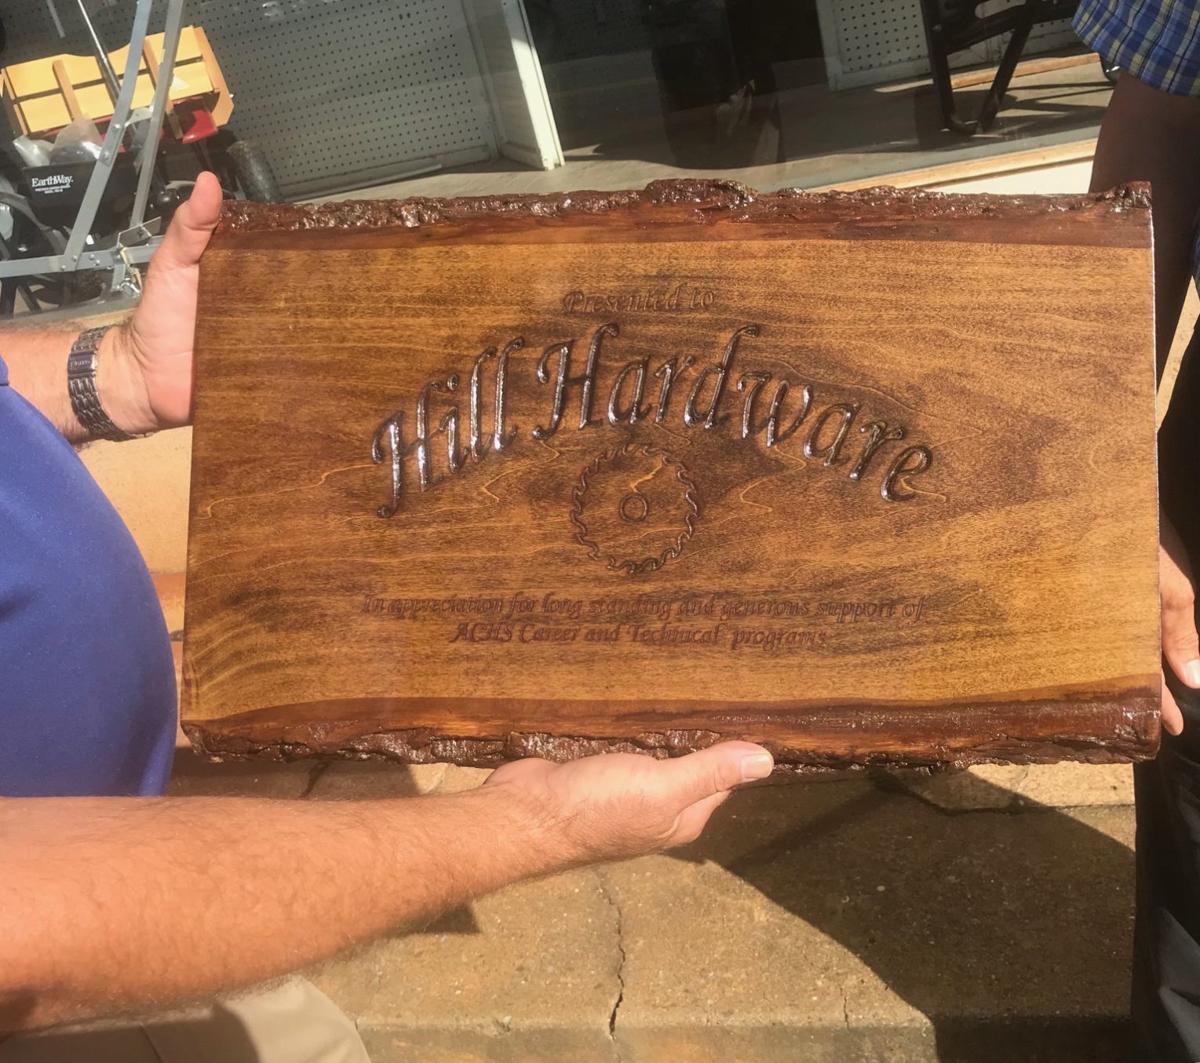 Hill Hardware plaque